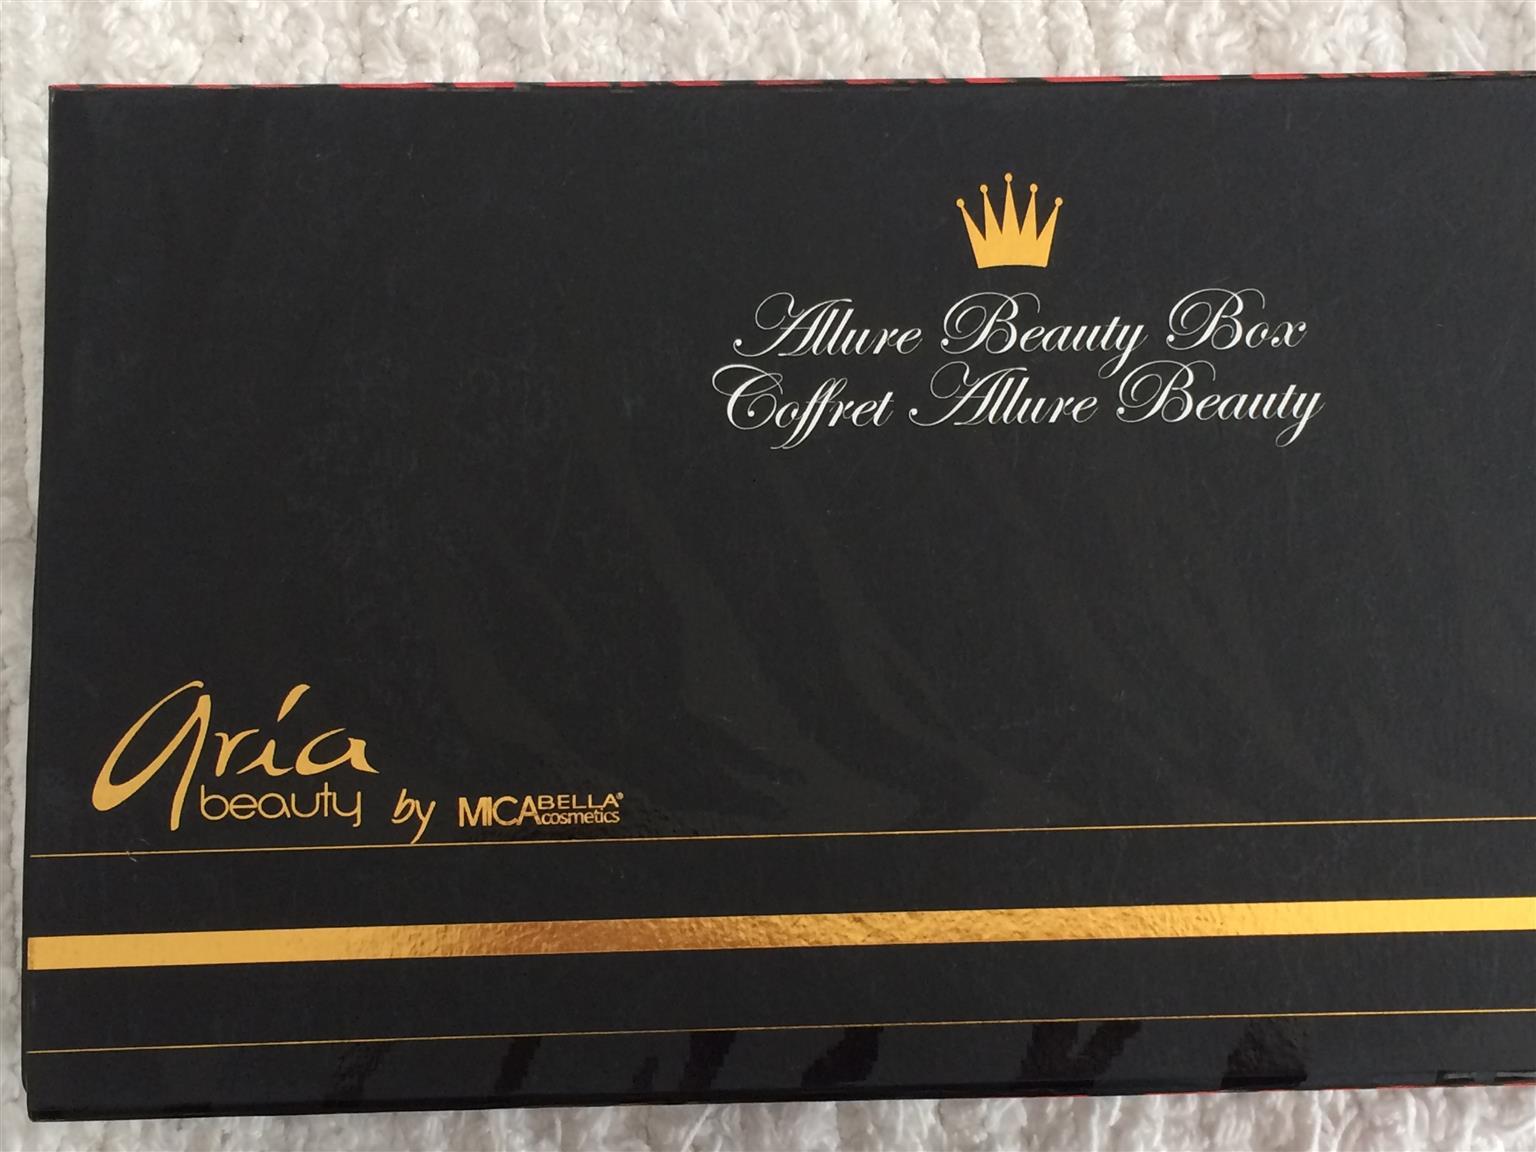 Aria Beauty- Allure Beauty Box